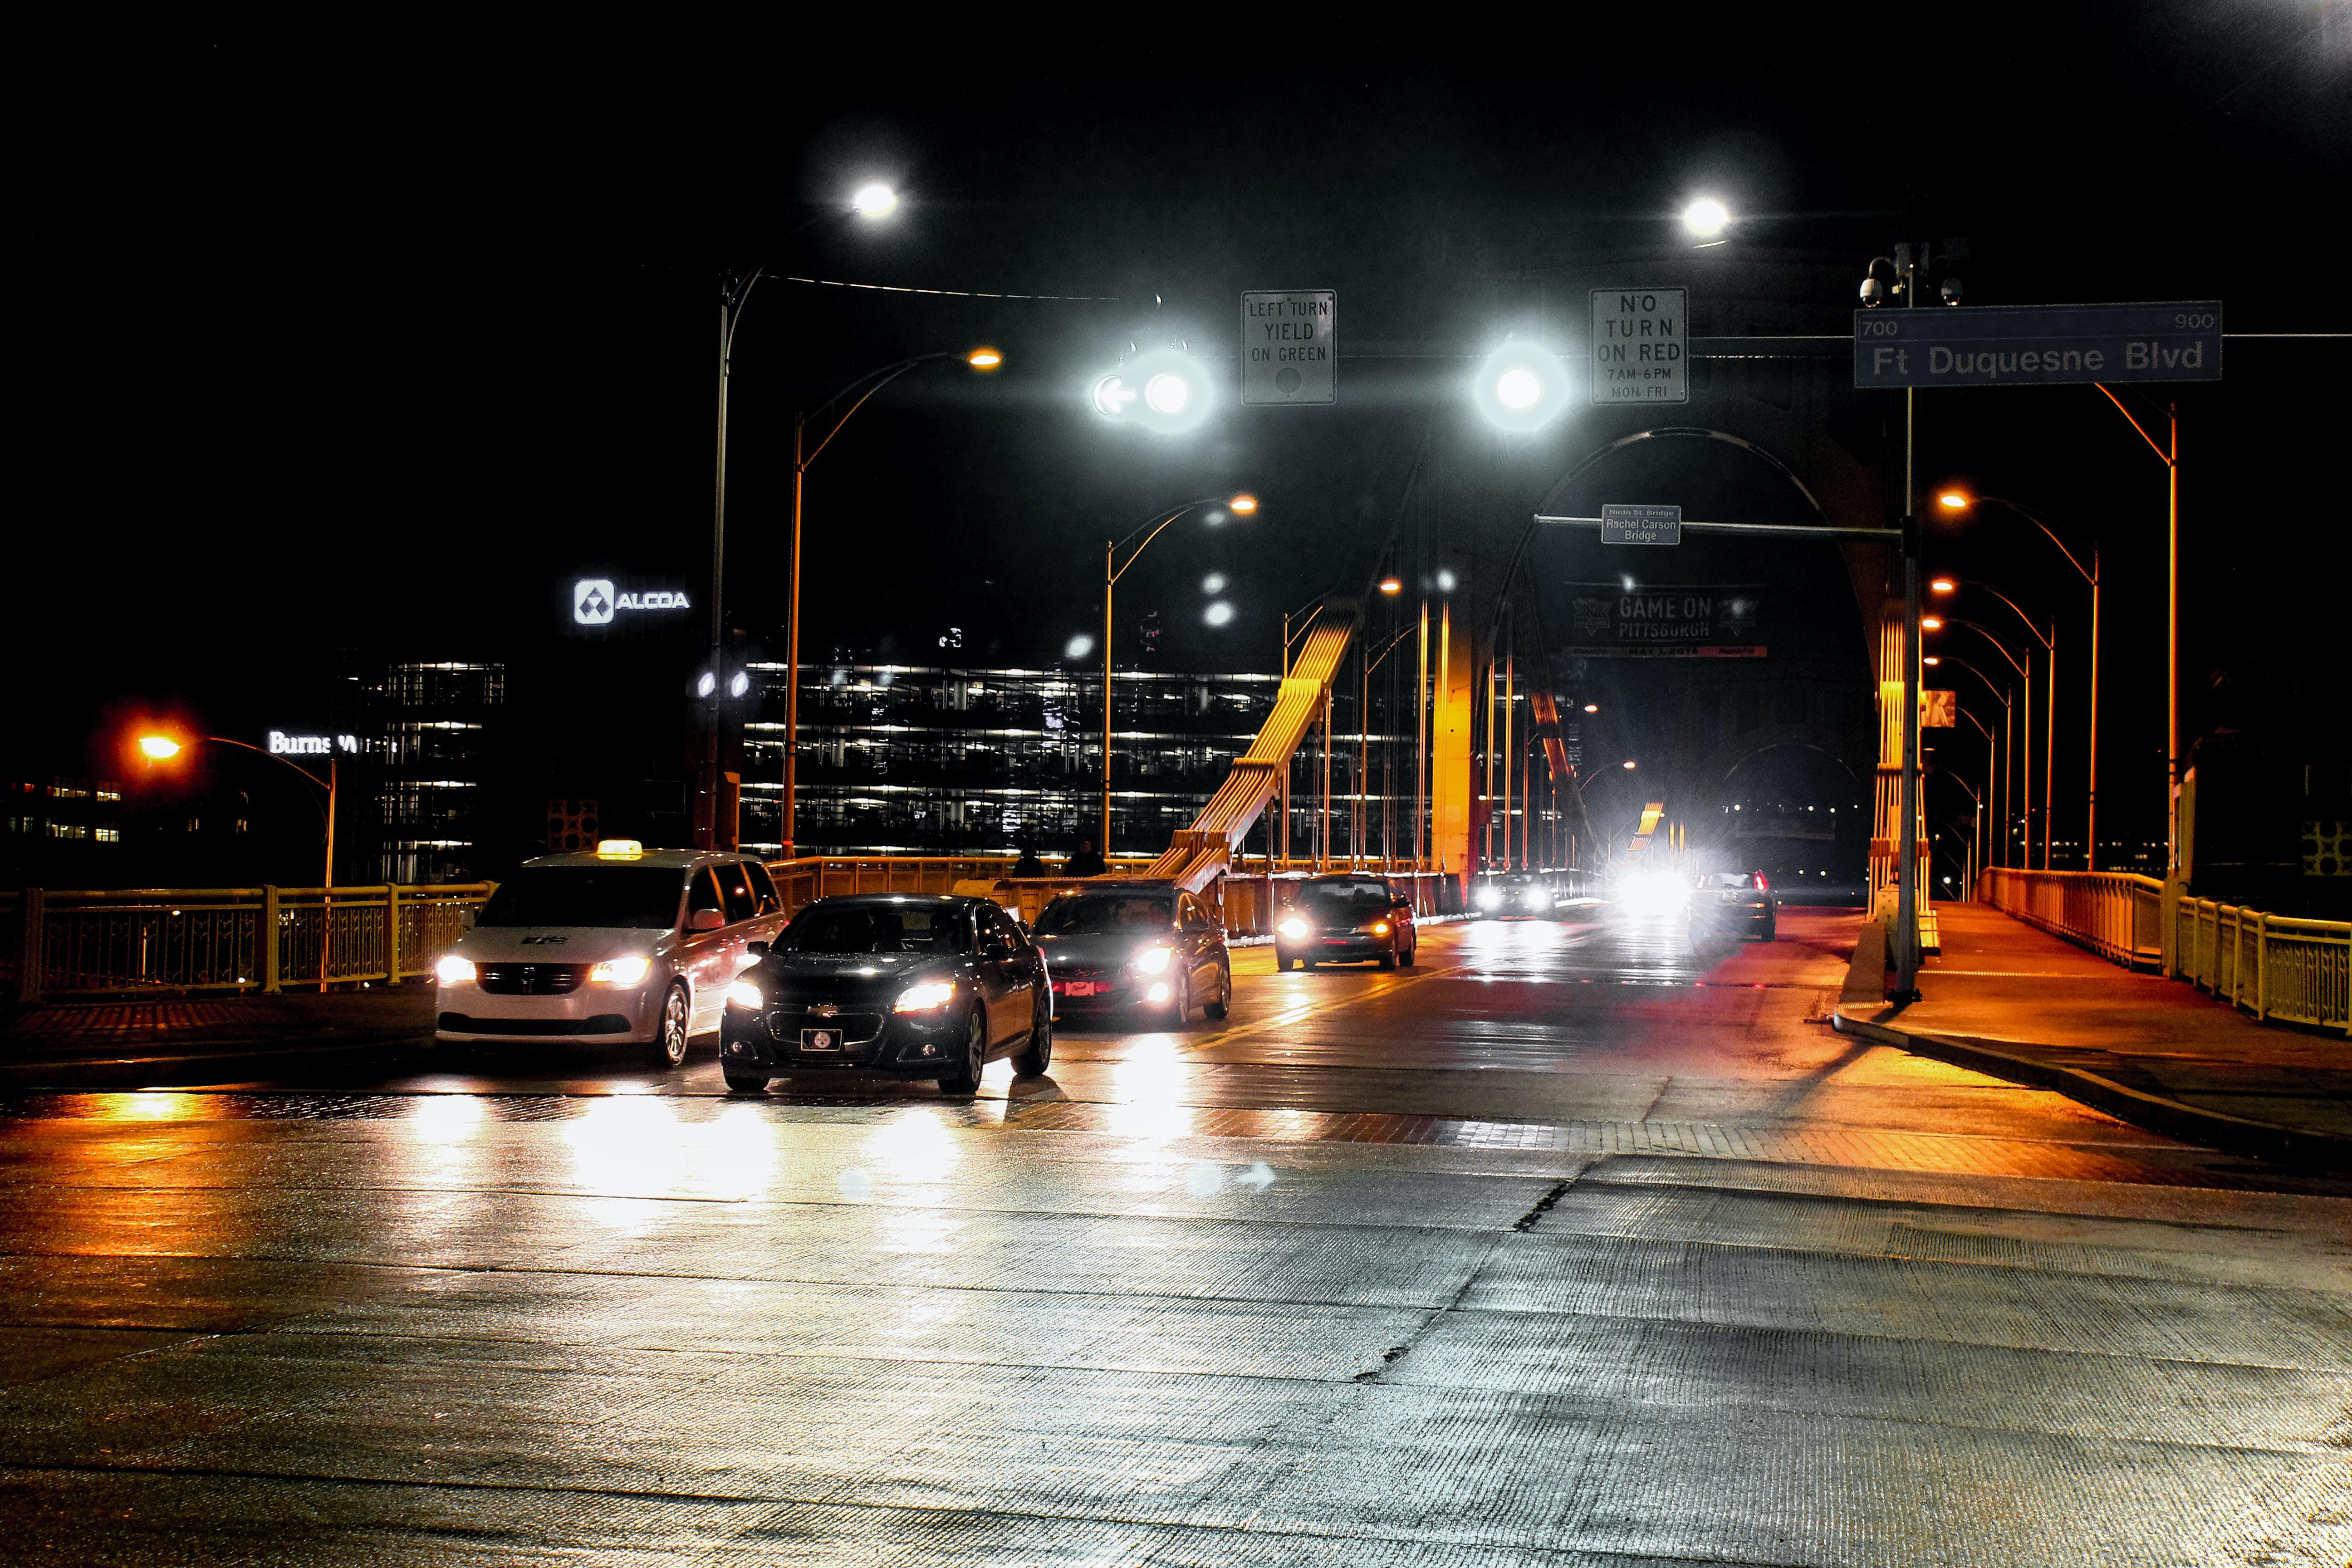 Vehicle on Road at Night